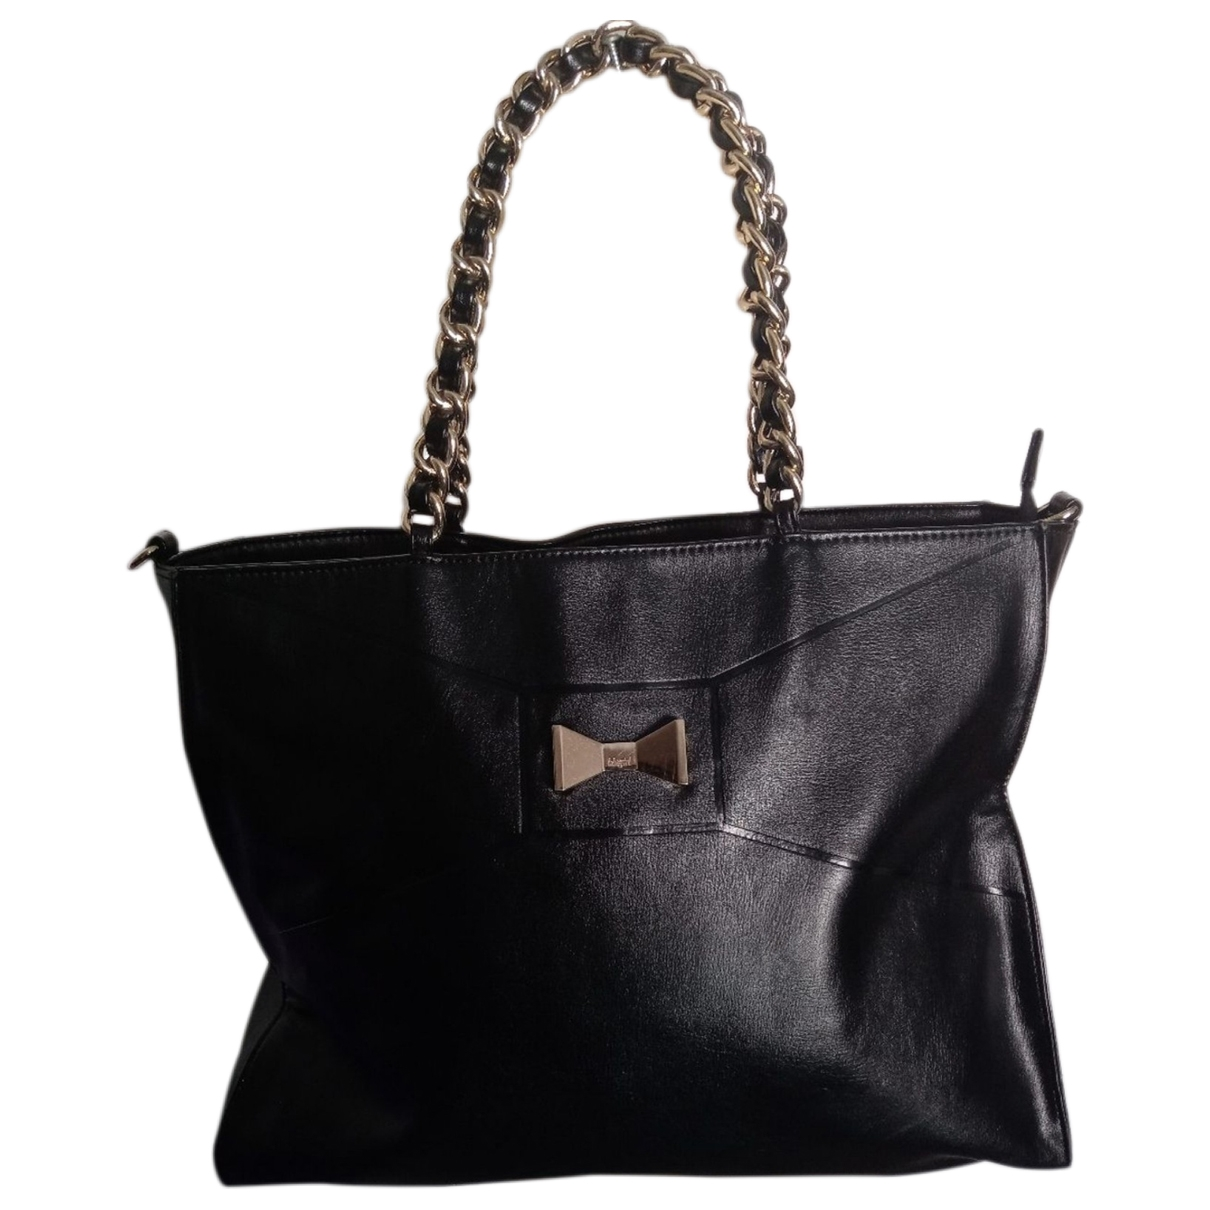 Blumarine \N Handtasche in  Schwarz Synthetik